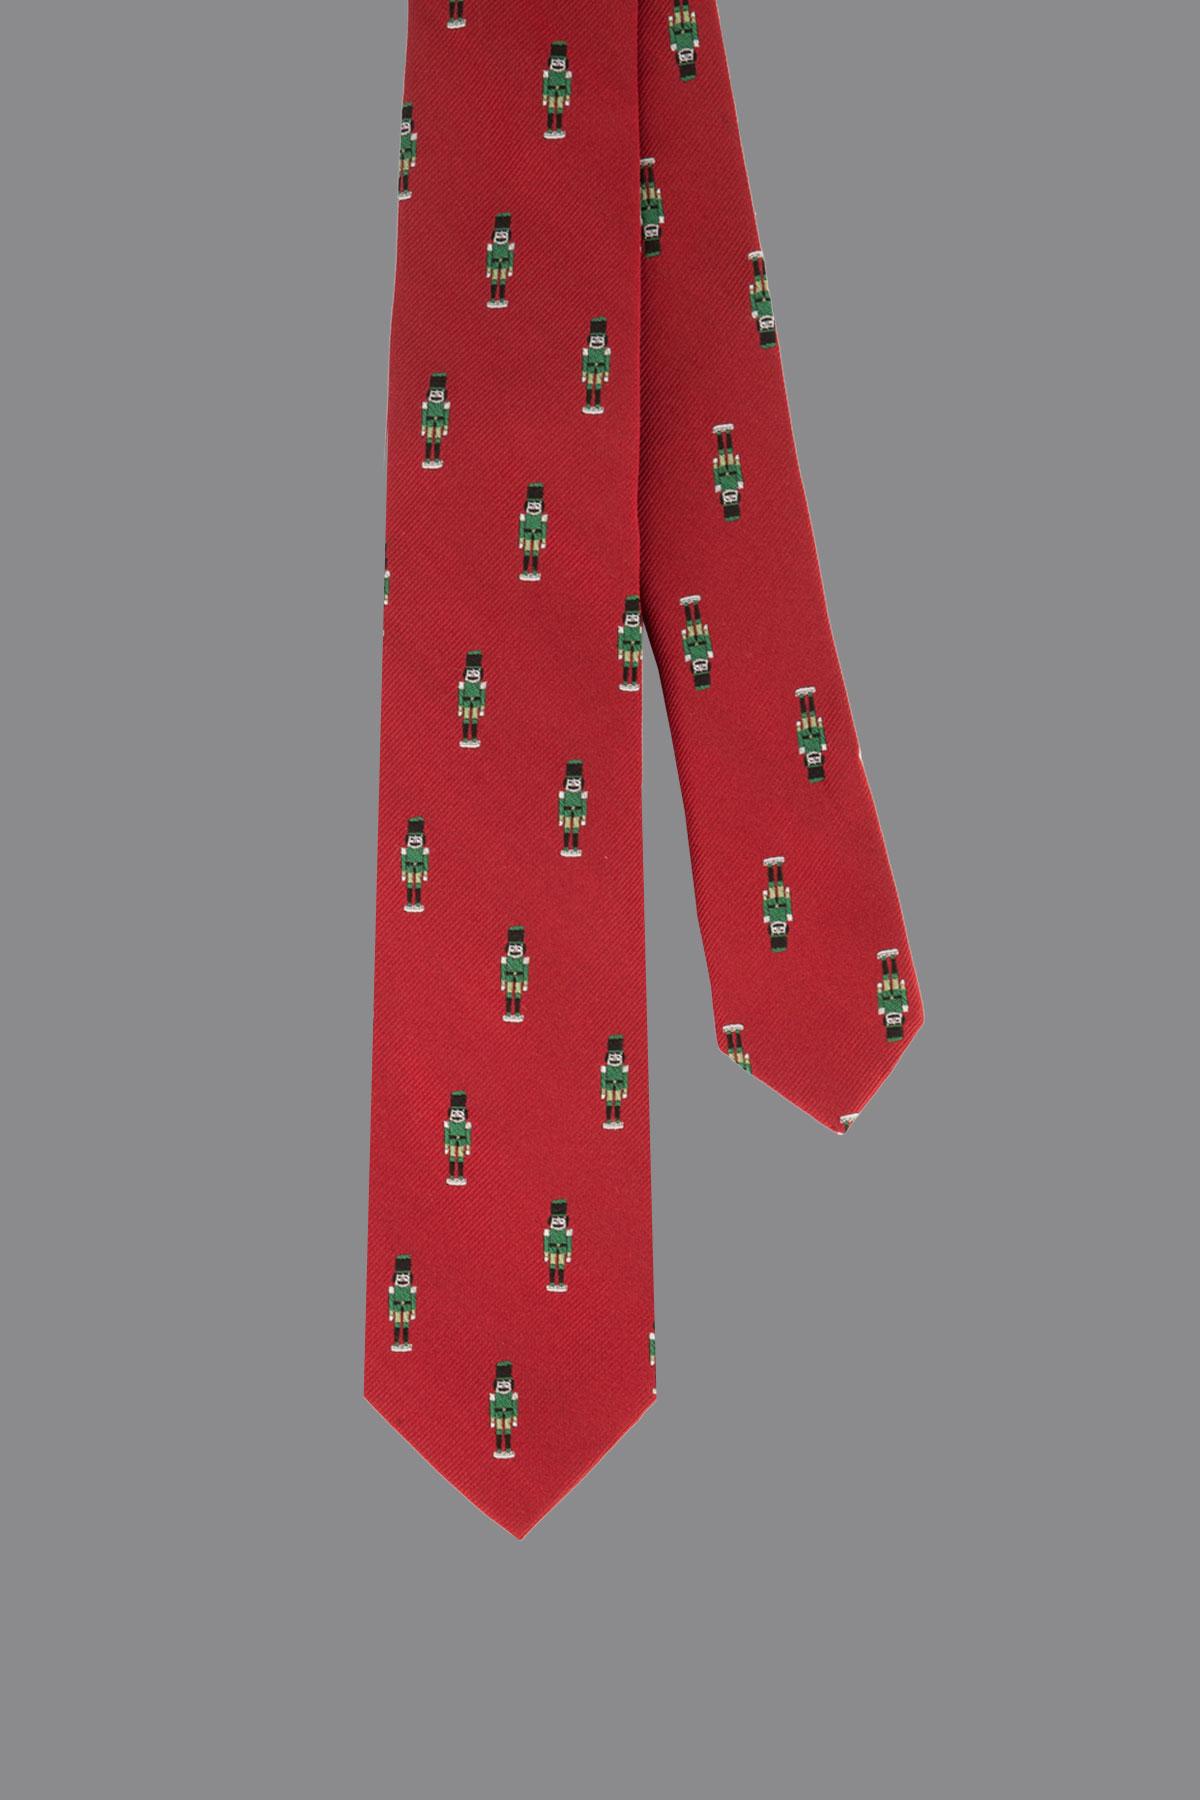 Corbata POLO RALPH LAUREN color Rojo